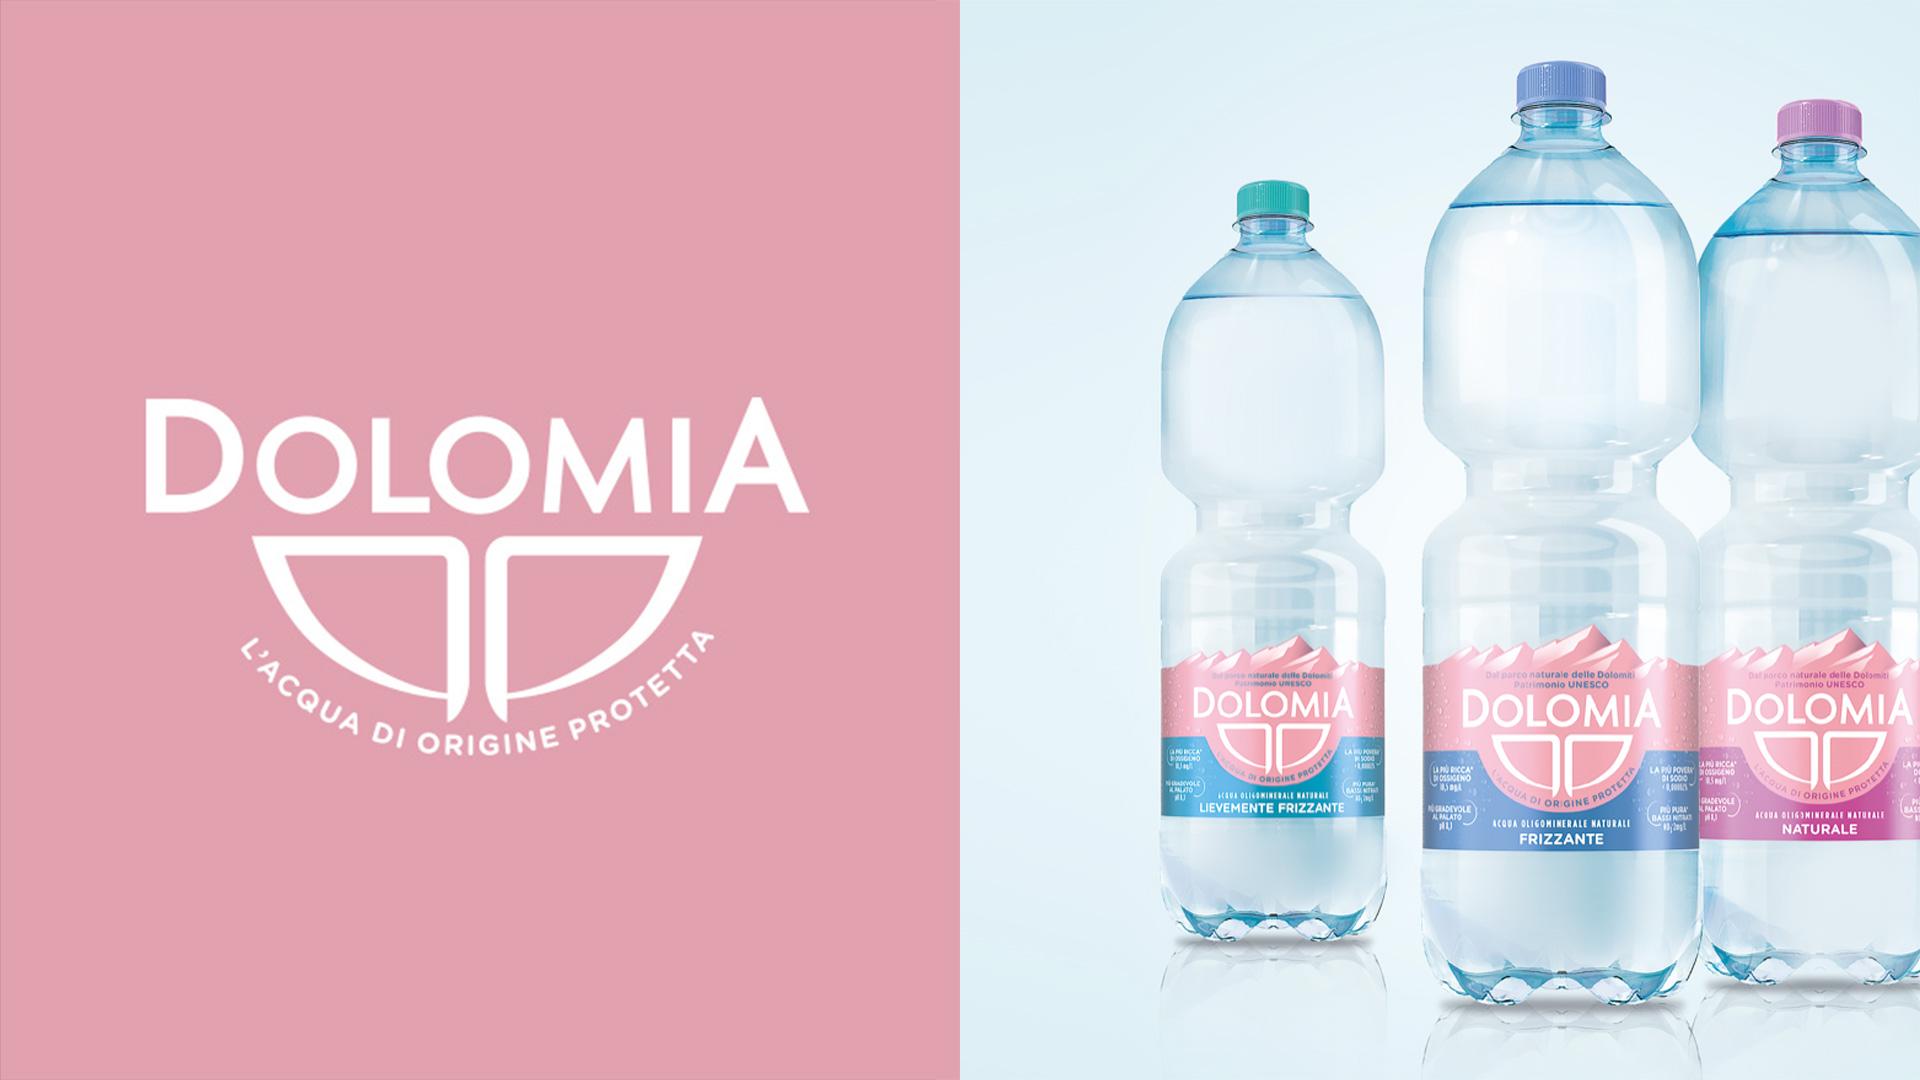 Dolomia-Rba-Design-002